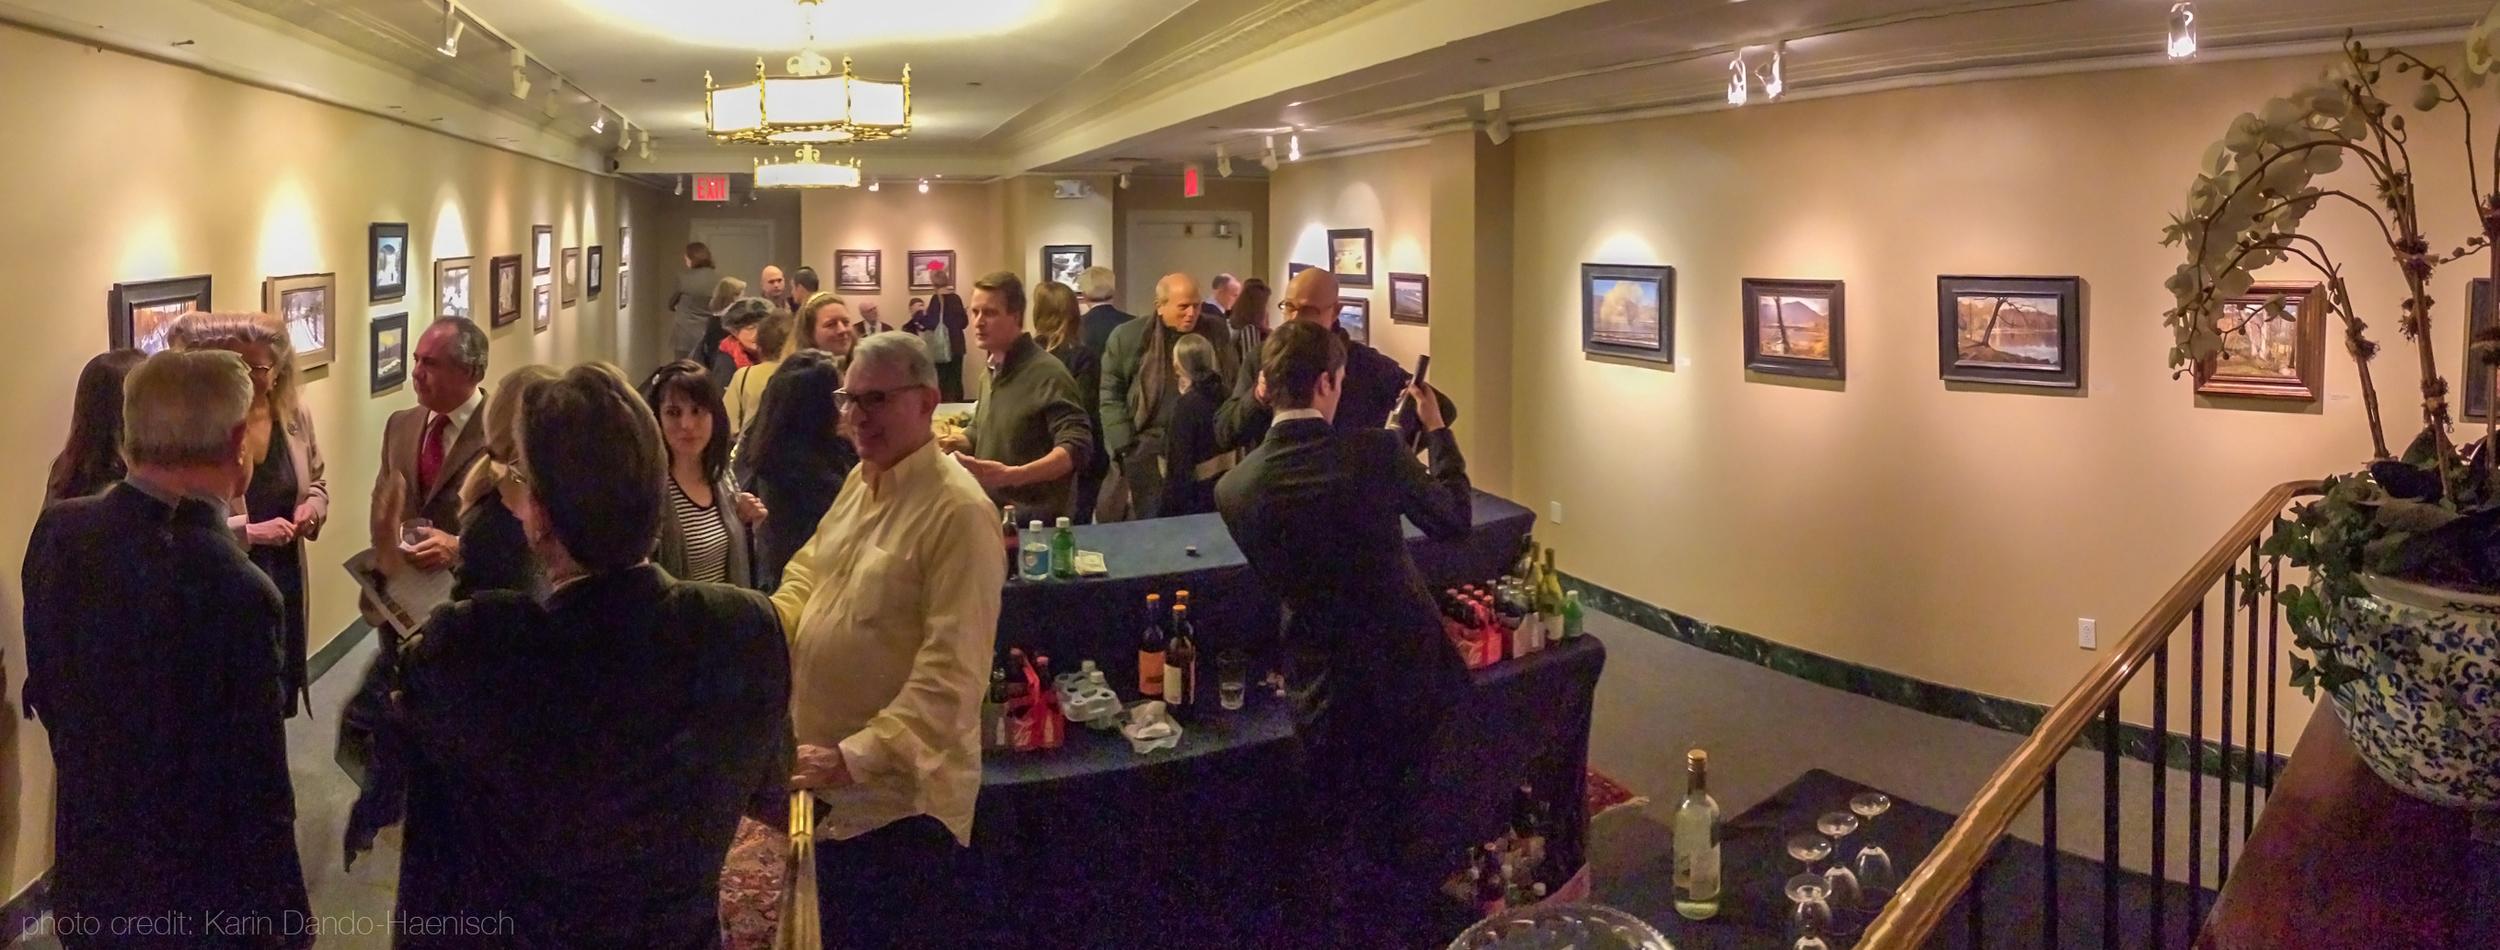 Artist's Reception Wednesday, December 10th, 2014